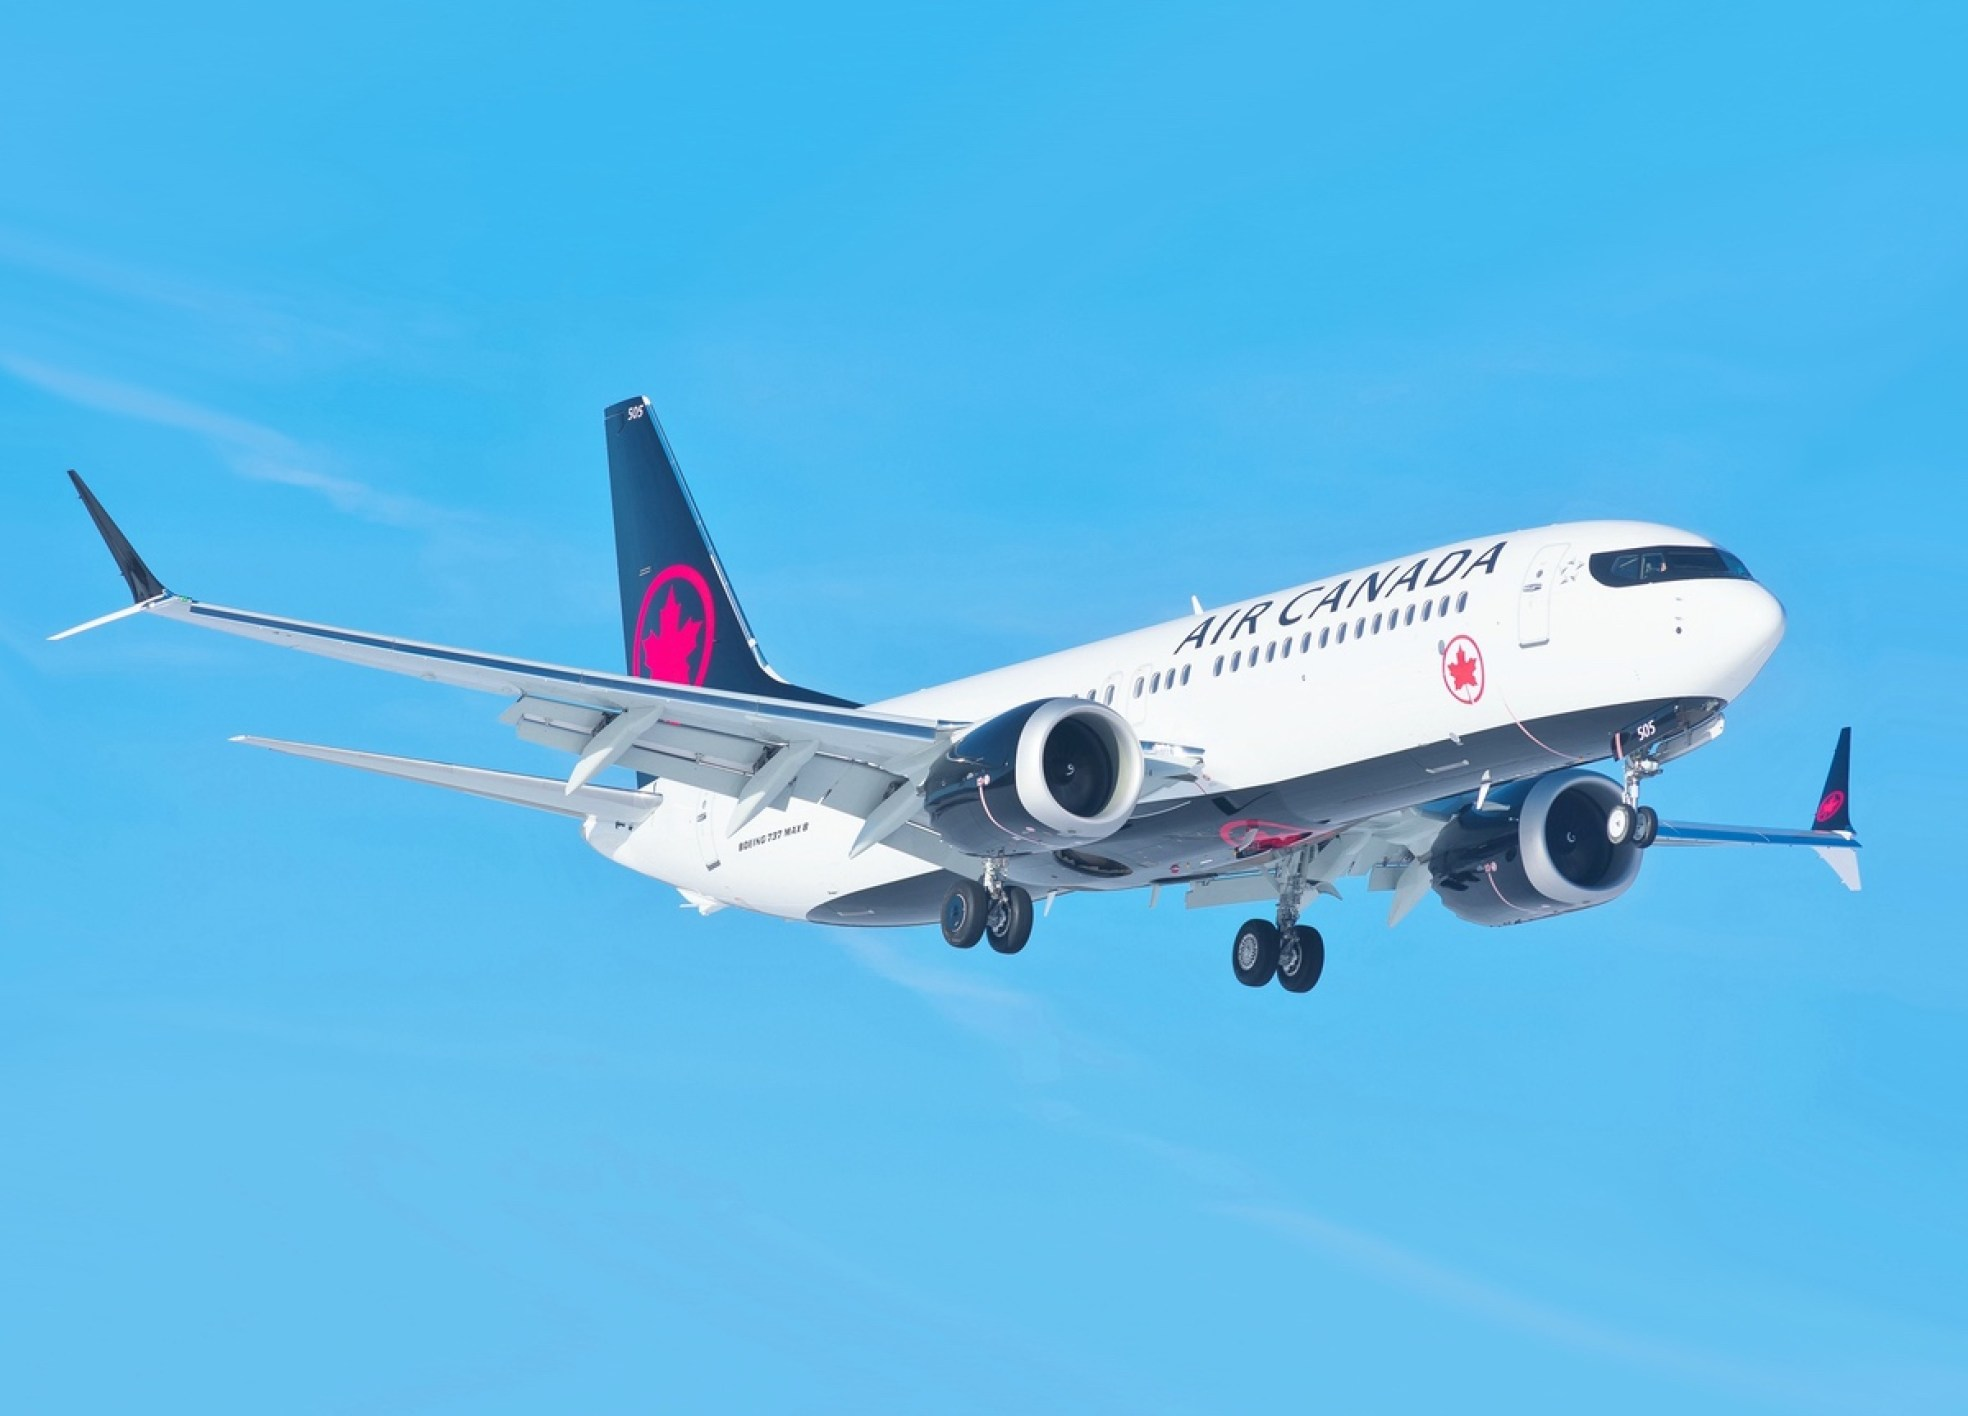 Air Canada Boeing 737 MAX 8 - March 12, 2018 (Liam Allport/Flickr)